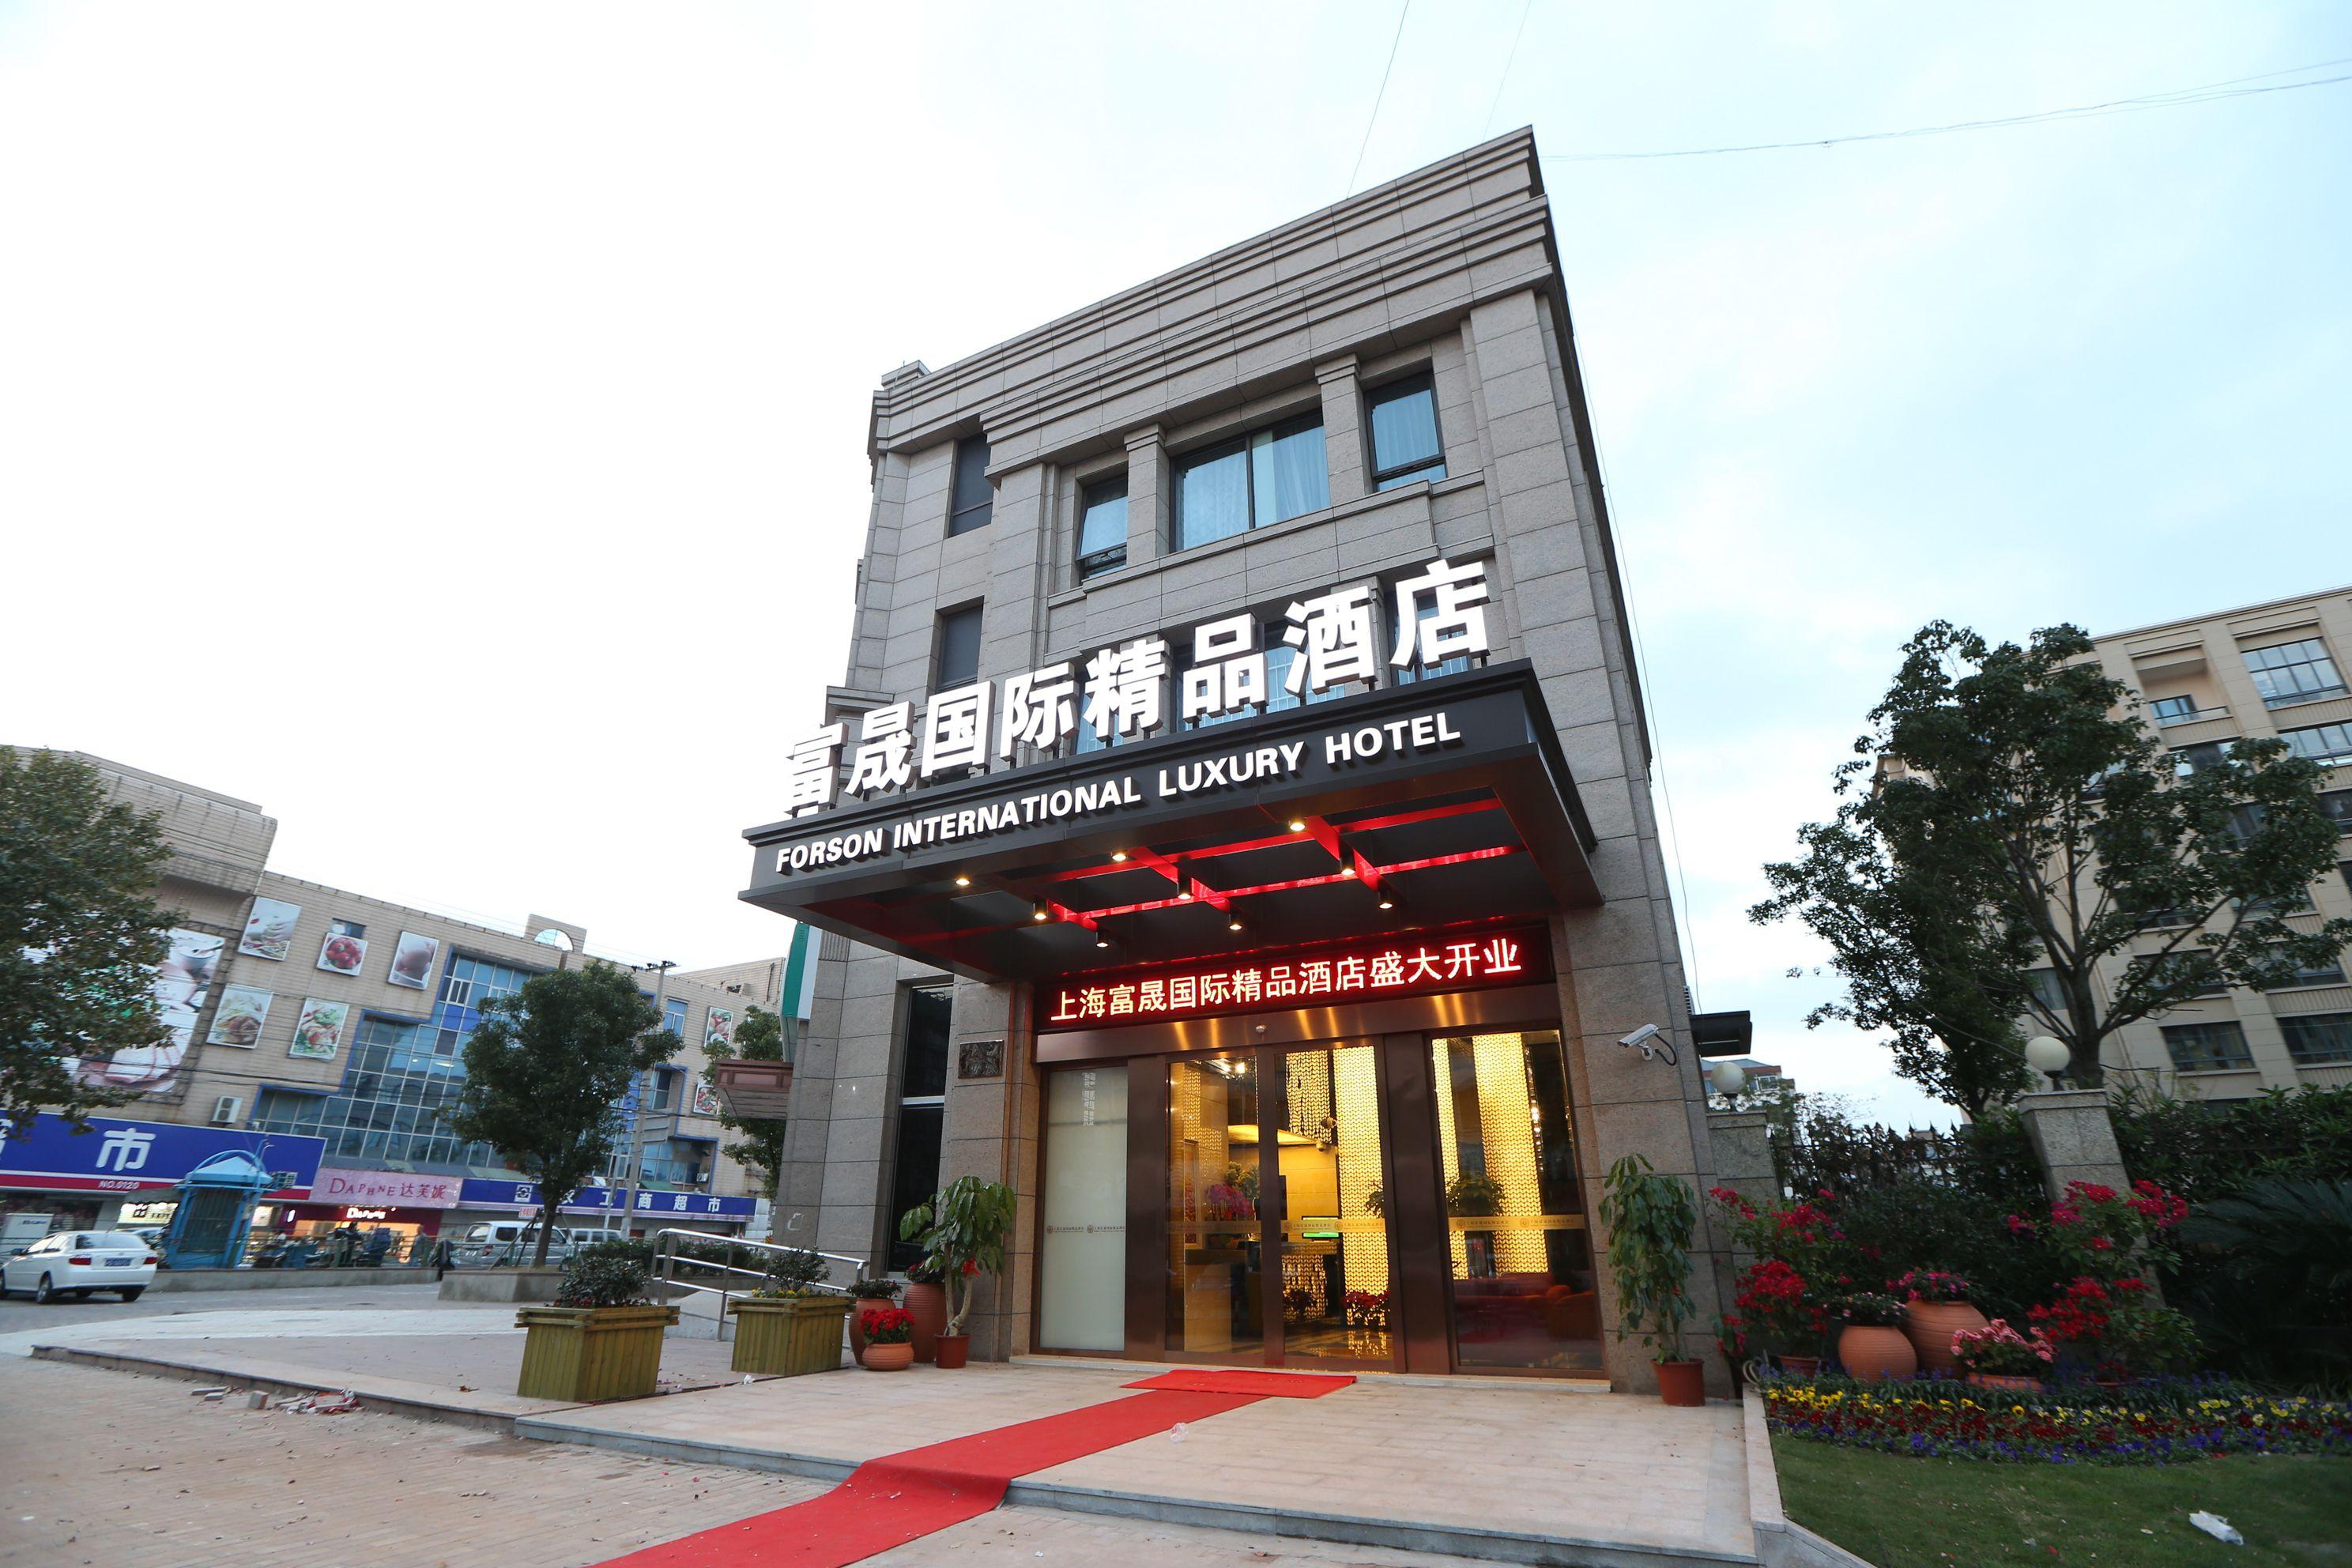 Shanghai Forson Intl Boutique Hotel - I